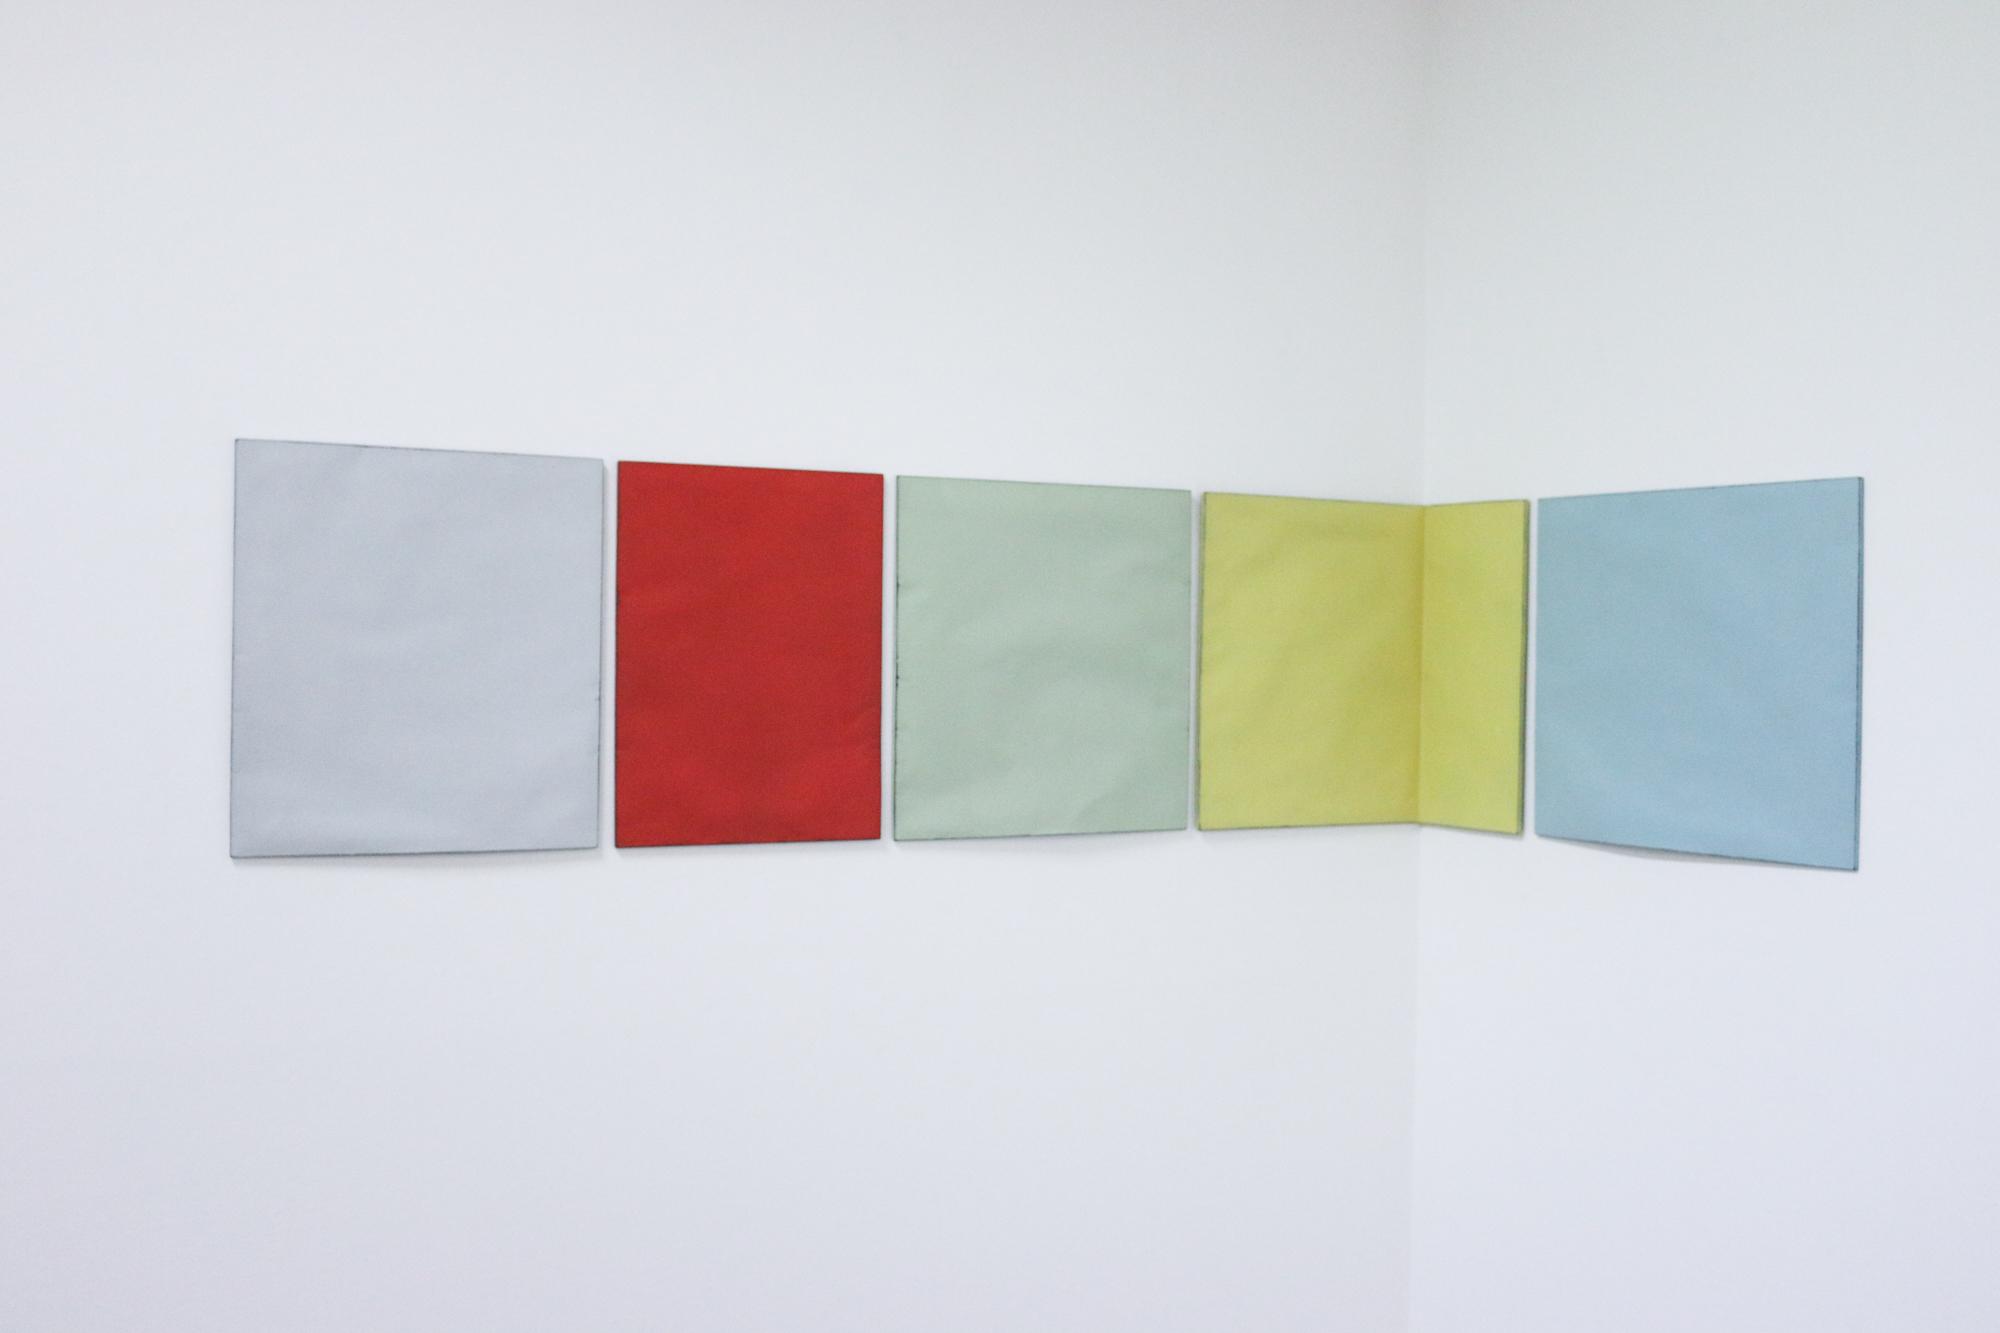 Johan De Wit, Untitled, 2018, Paper, Resin, Marble, Acrylic, 241.5 x 45 cm, Affinity Art